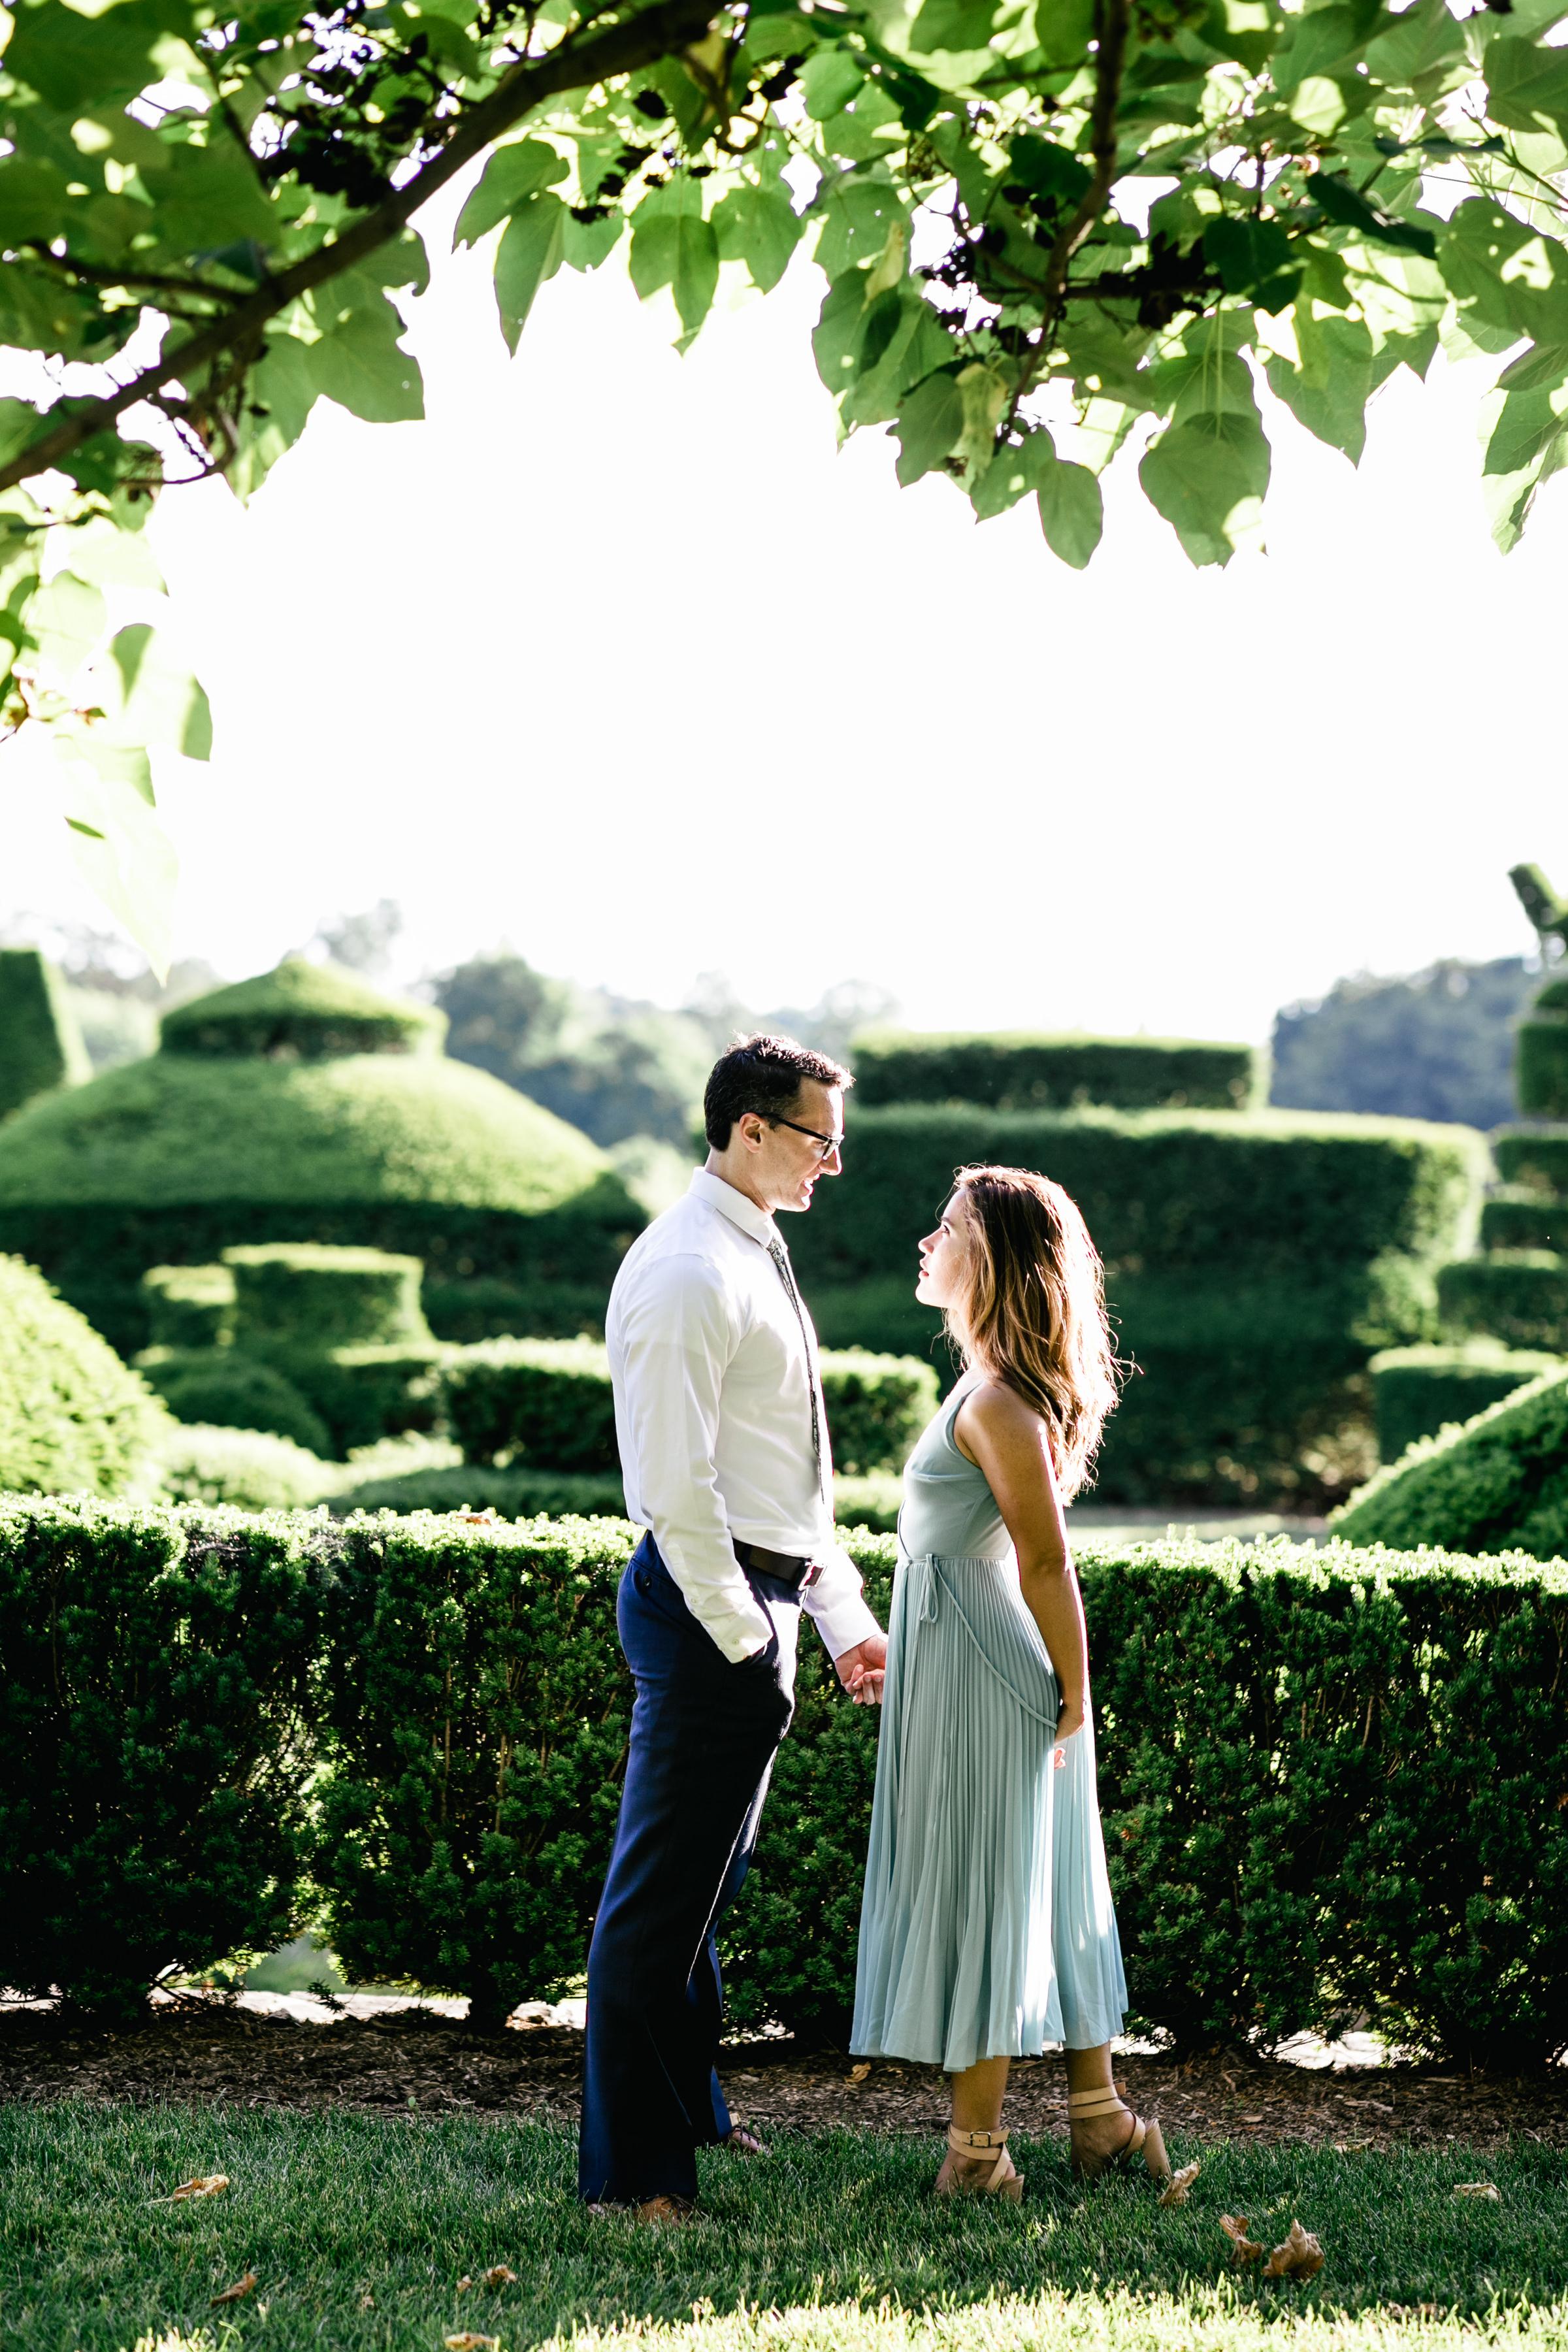 photography-natural-candid-engaged-proposal-philadelphia-wedding-longwood gardends-nature-flowers-modern-lifestyle-12.JPG